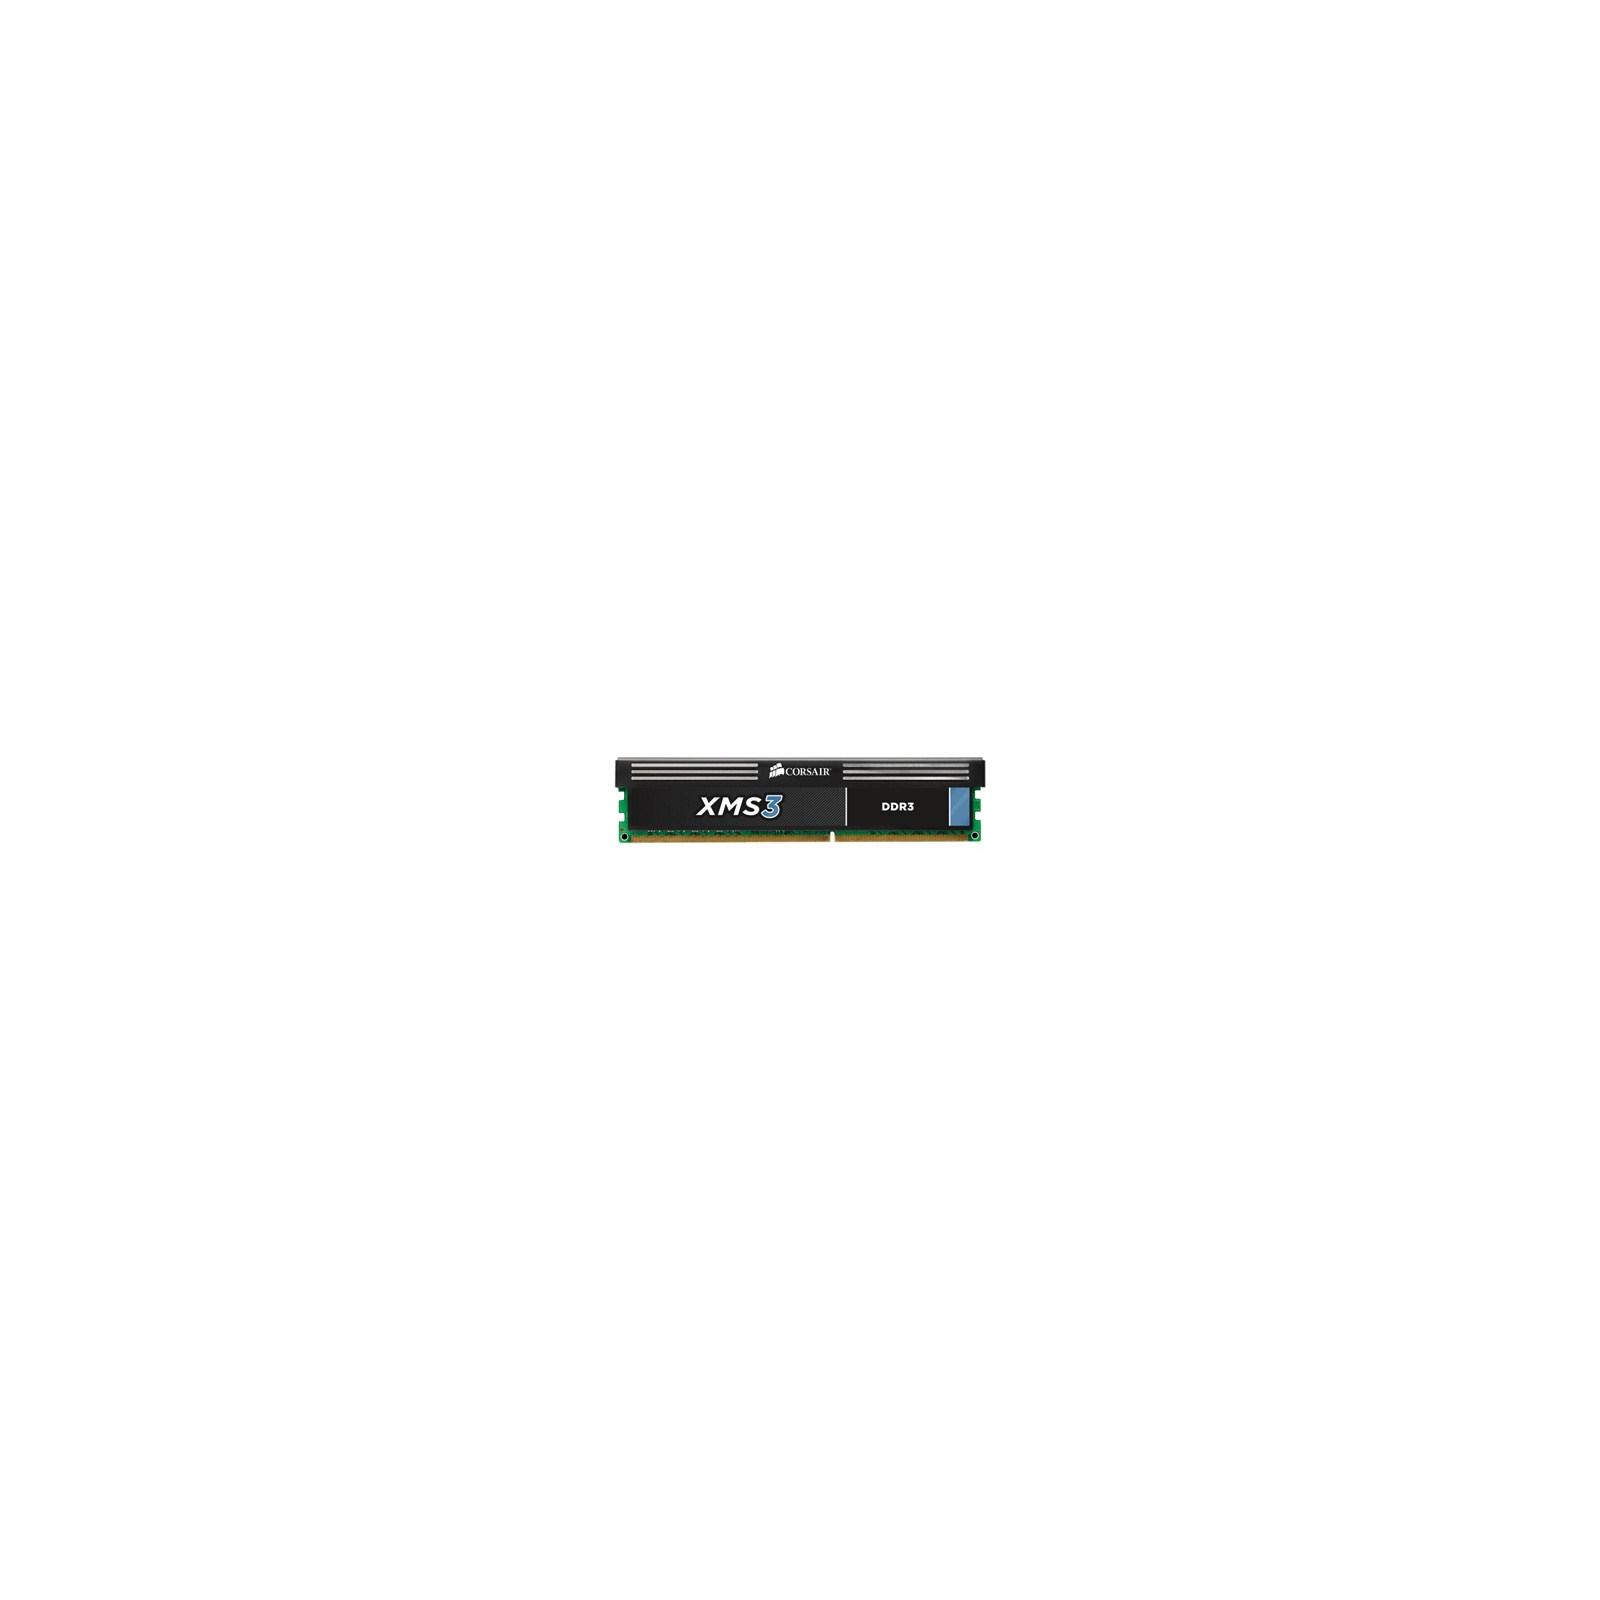 Модуль памяти для компьютера DDR3 4GB 1600 MHz CORSAIR (CMX4GX3M1A1600C11)